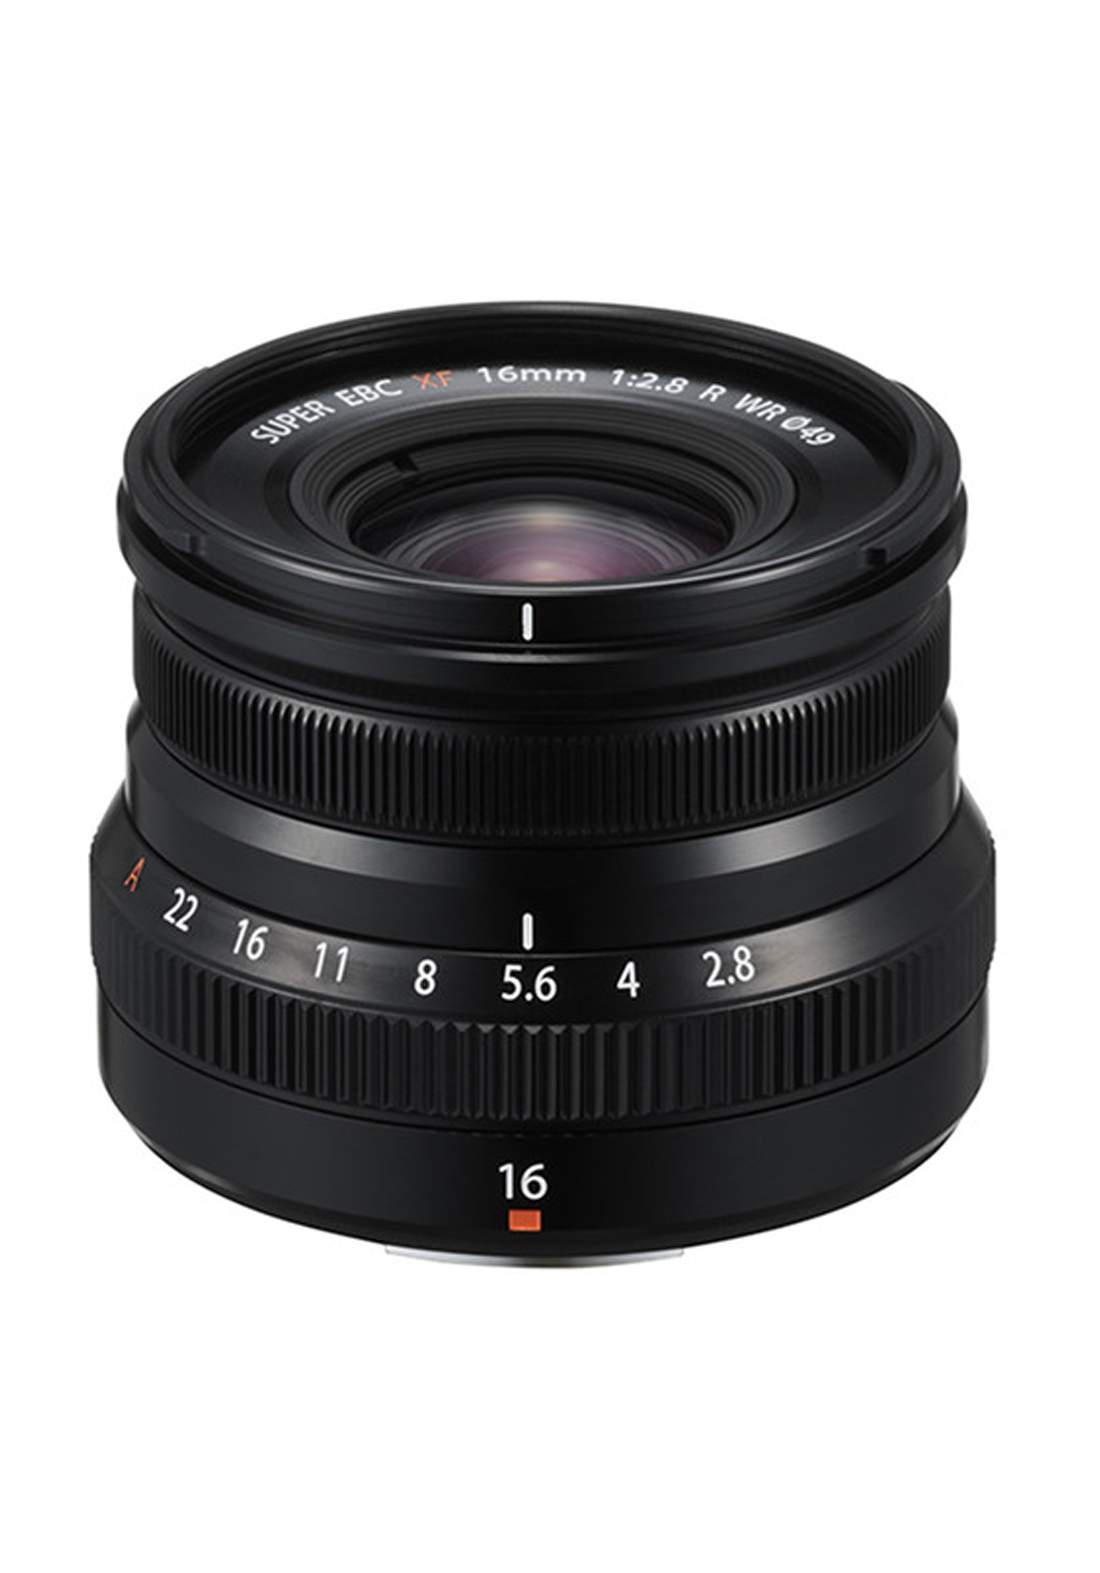 Fujifilm XF 16mm F2.8 R WR Lens - Black عدسة كاميرا